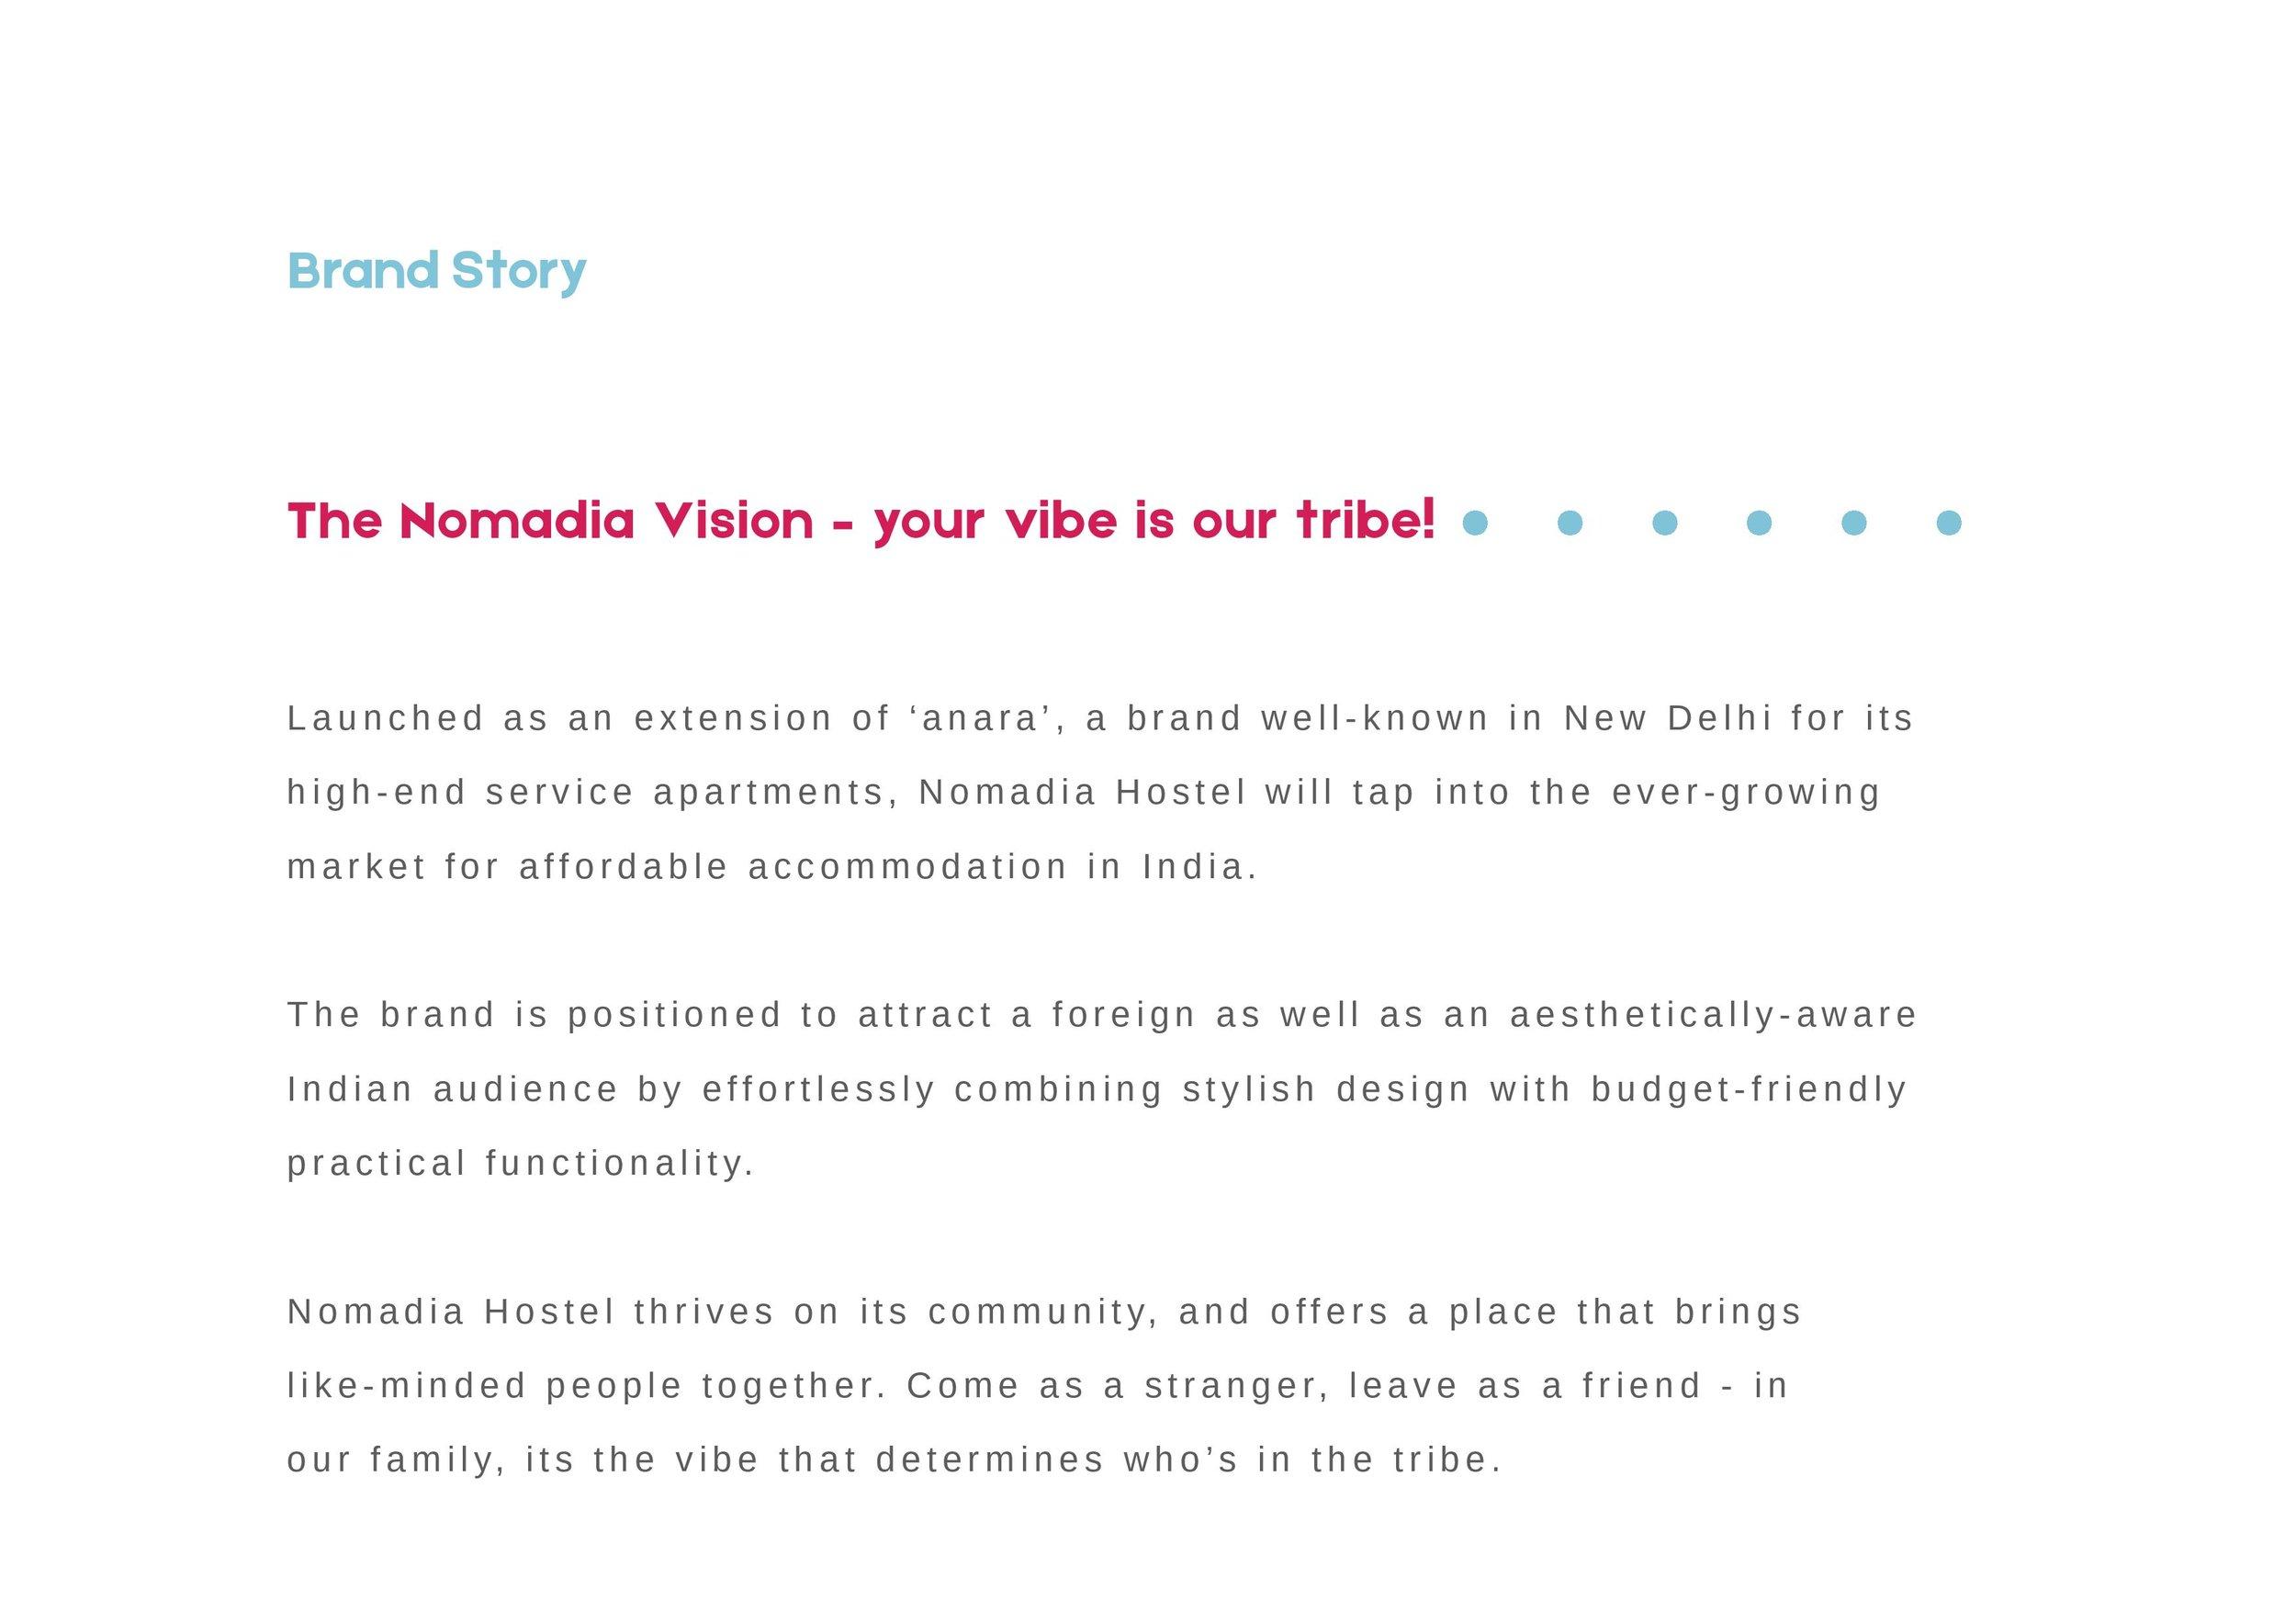 Brand Guideline_NomadiaHostel-page-002.jpg